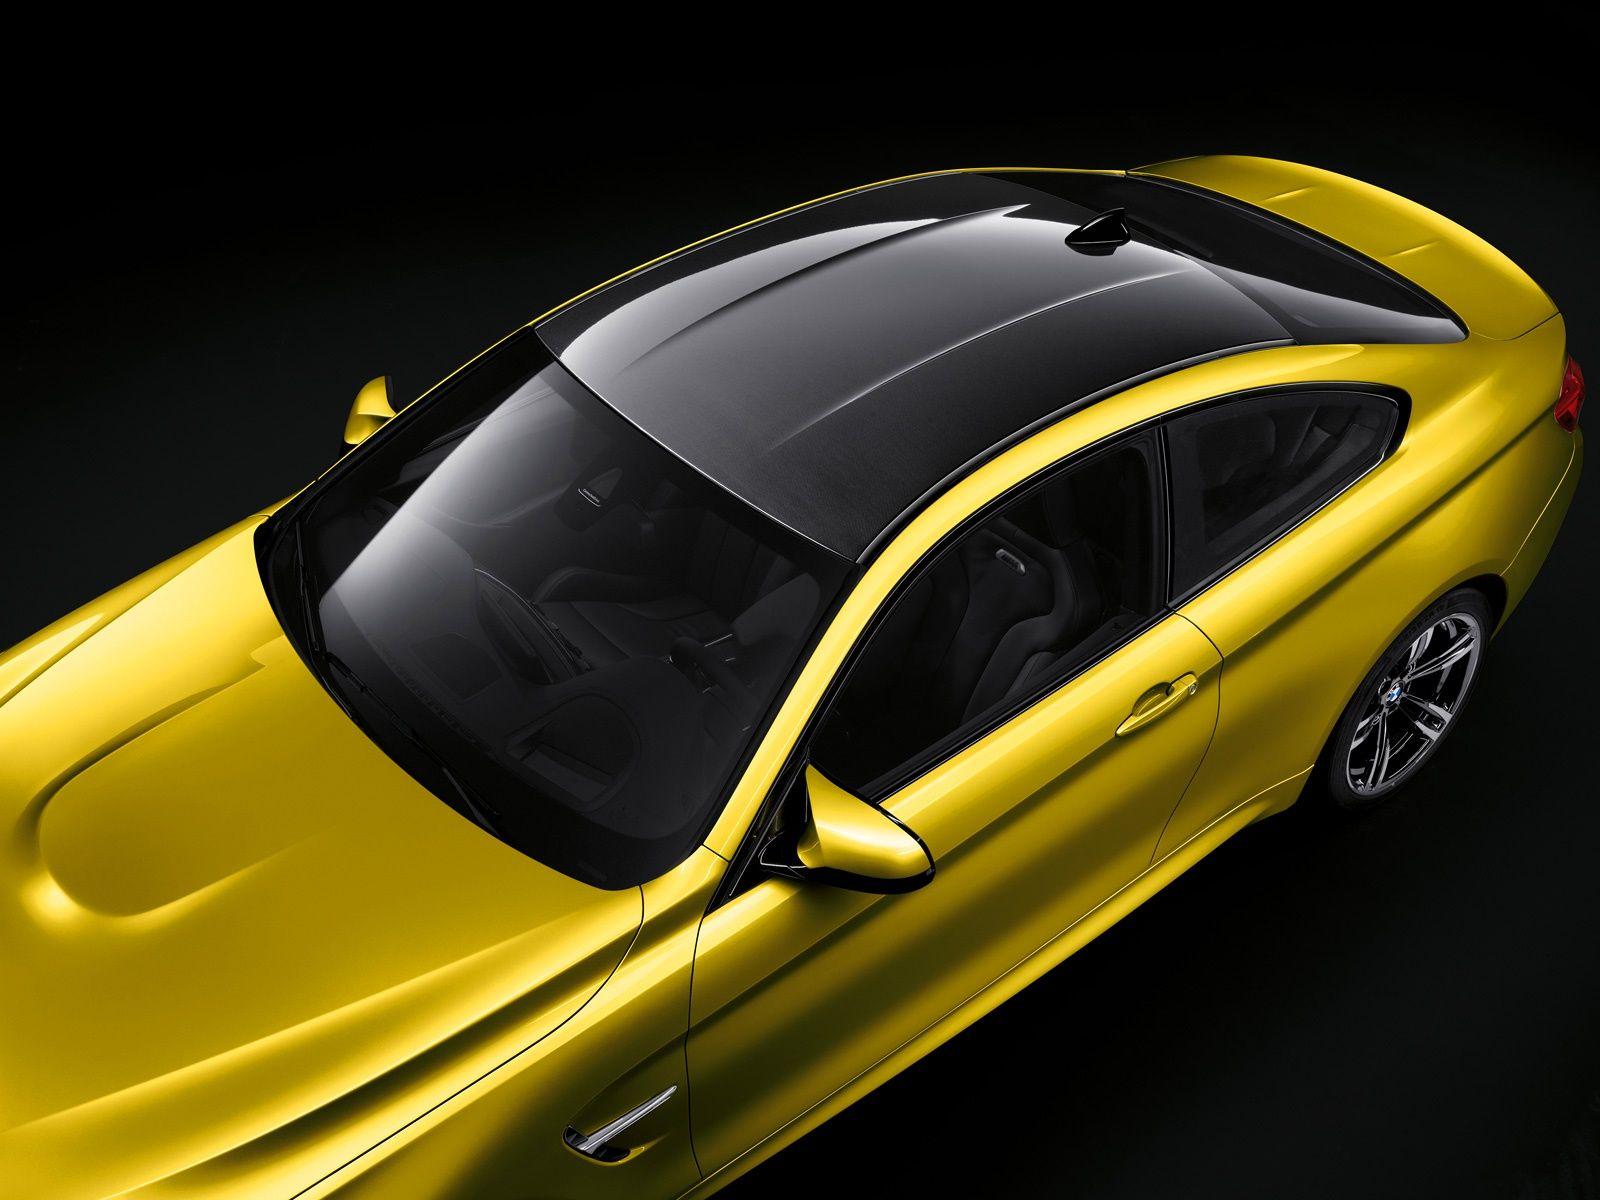 BMW M4 High Performance Cars For Sale BMW M GmbH